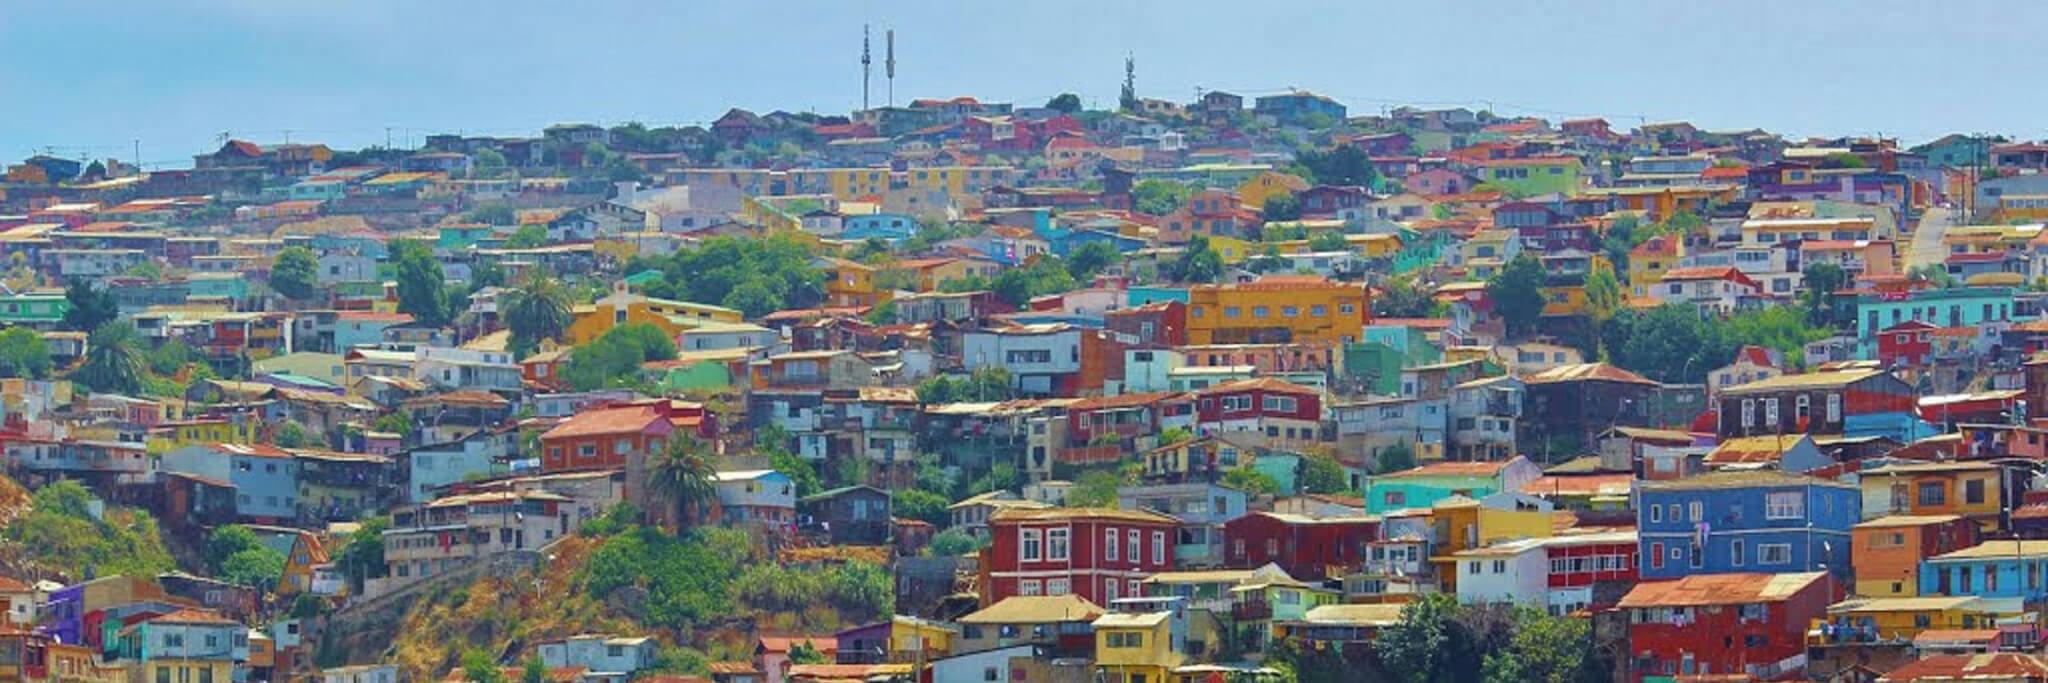 JugendBildungsmesse - Freiwilligenarbeit Valparaiso